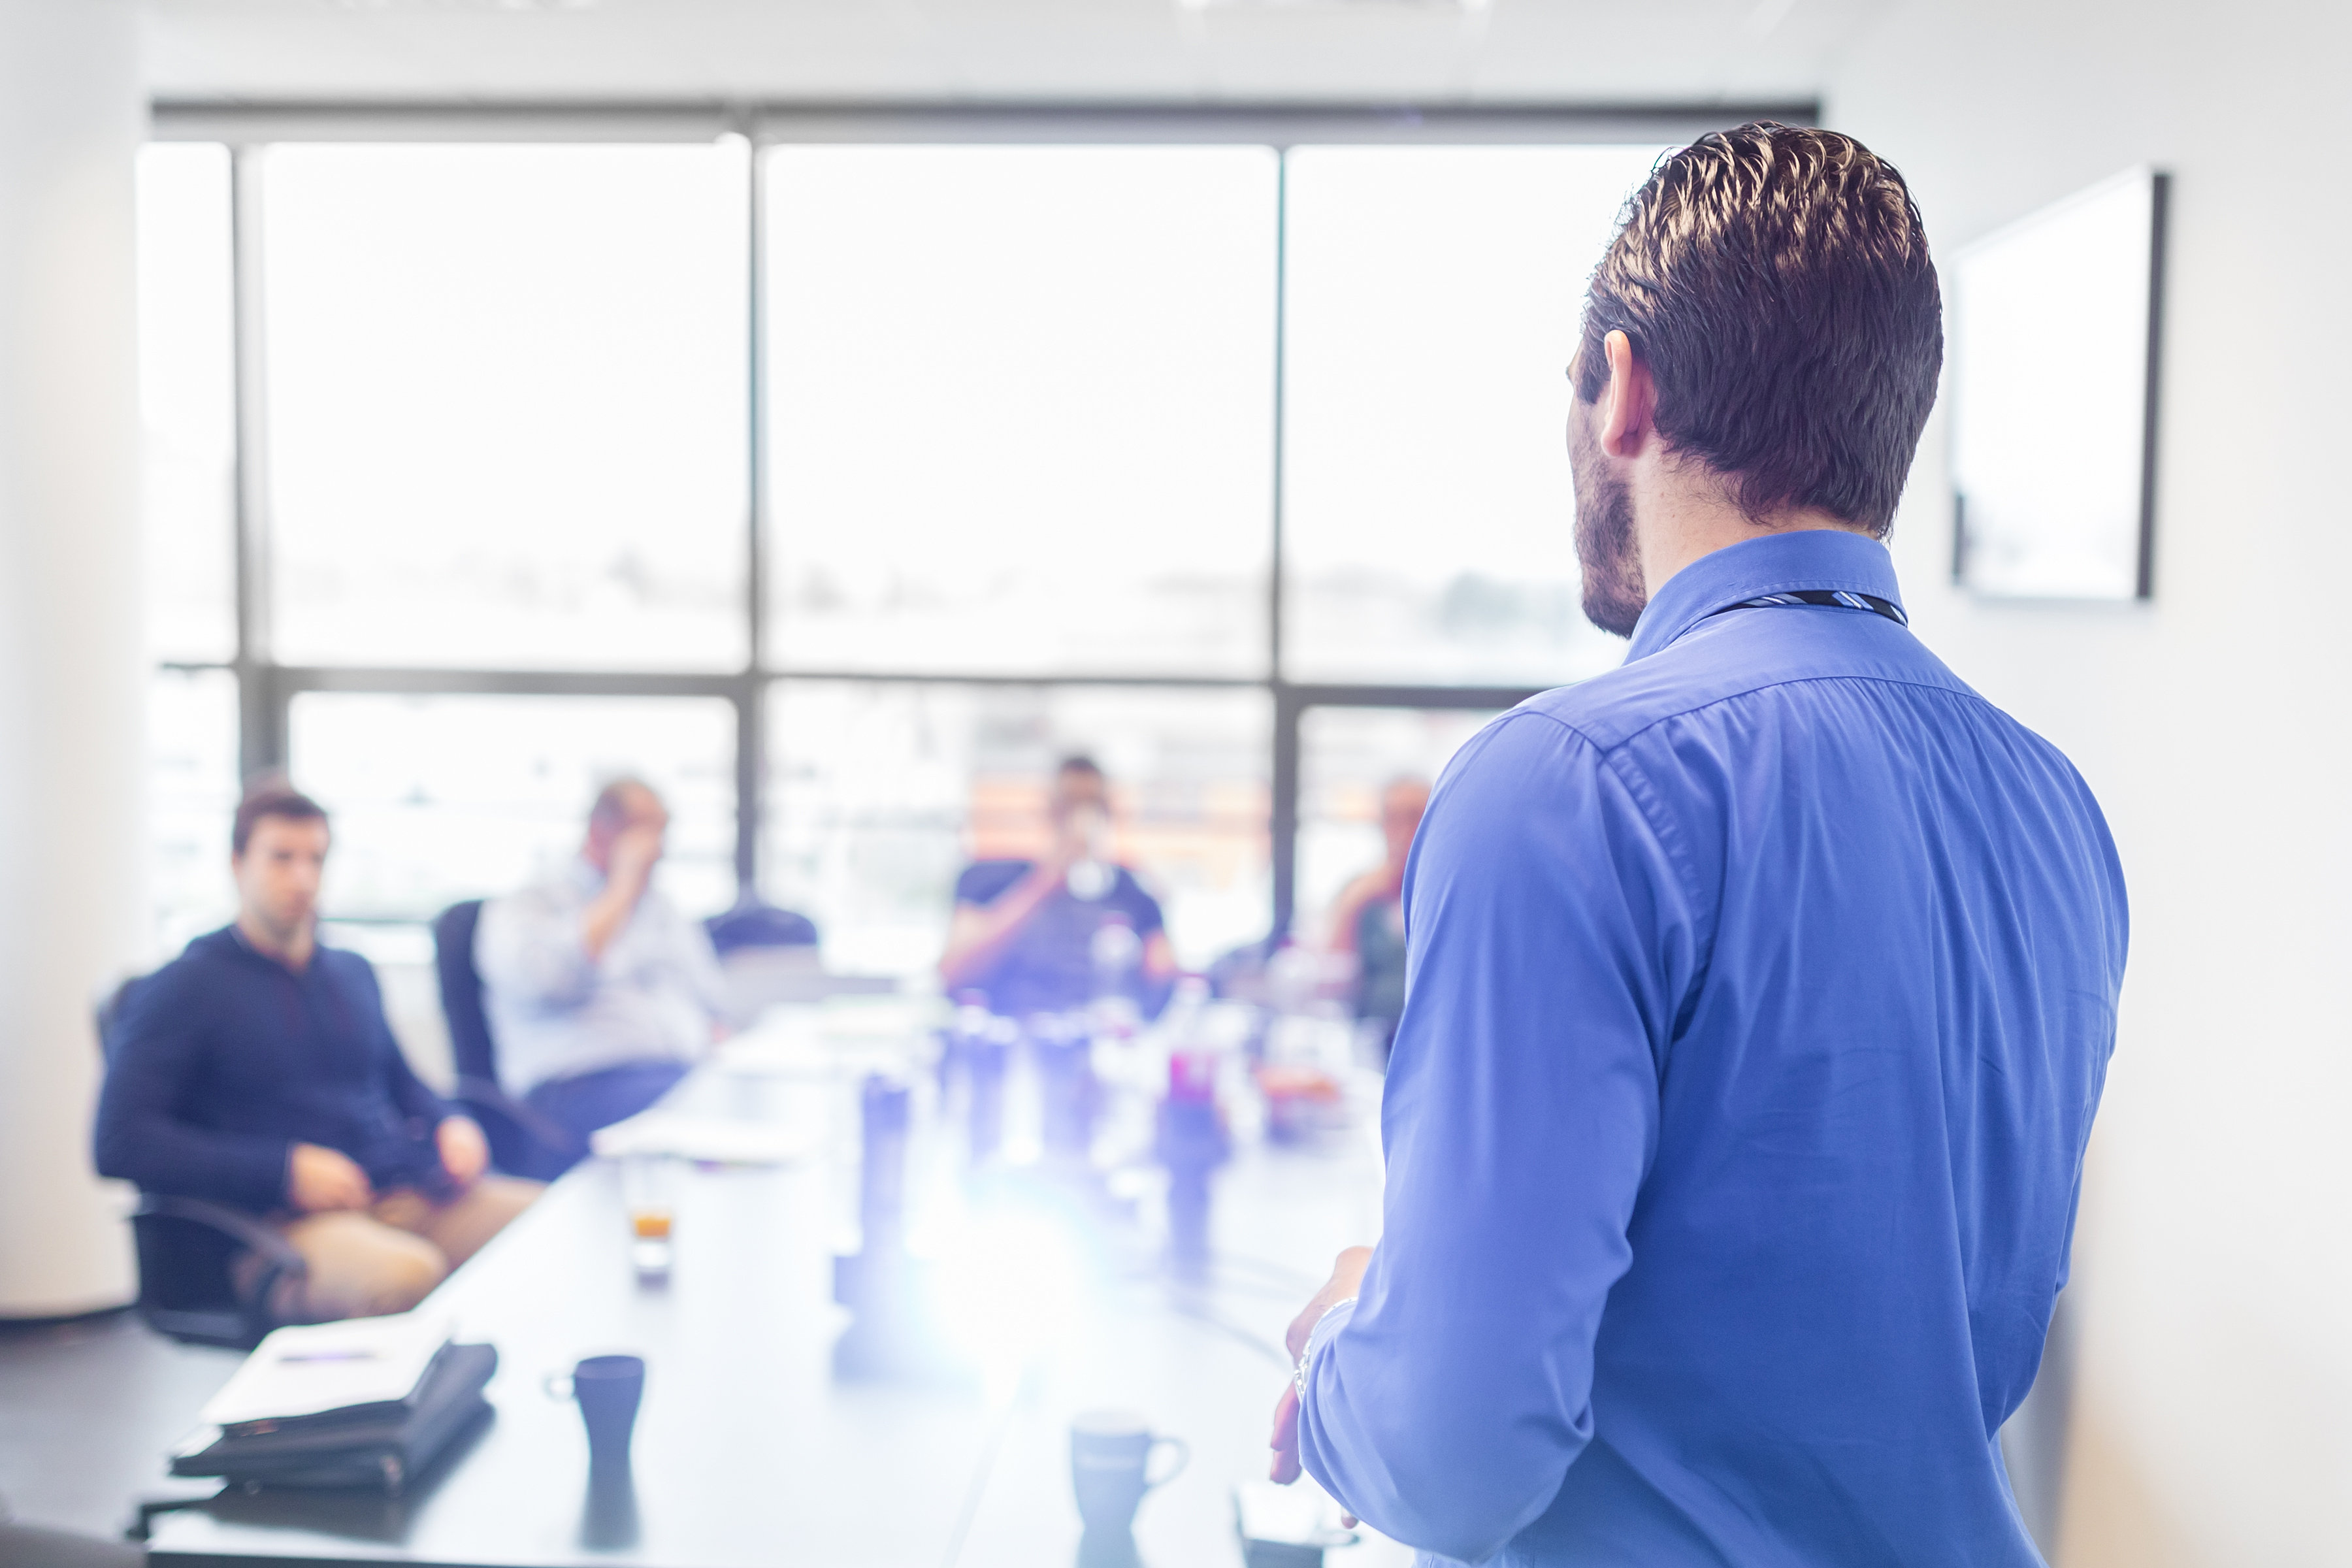 boltongroup – Business Presentation